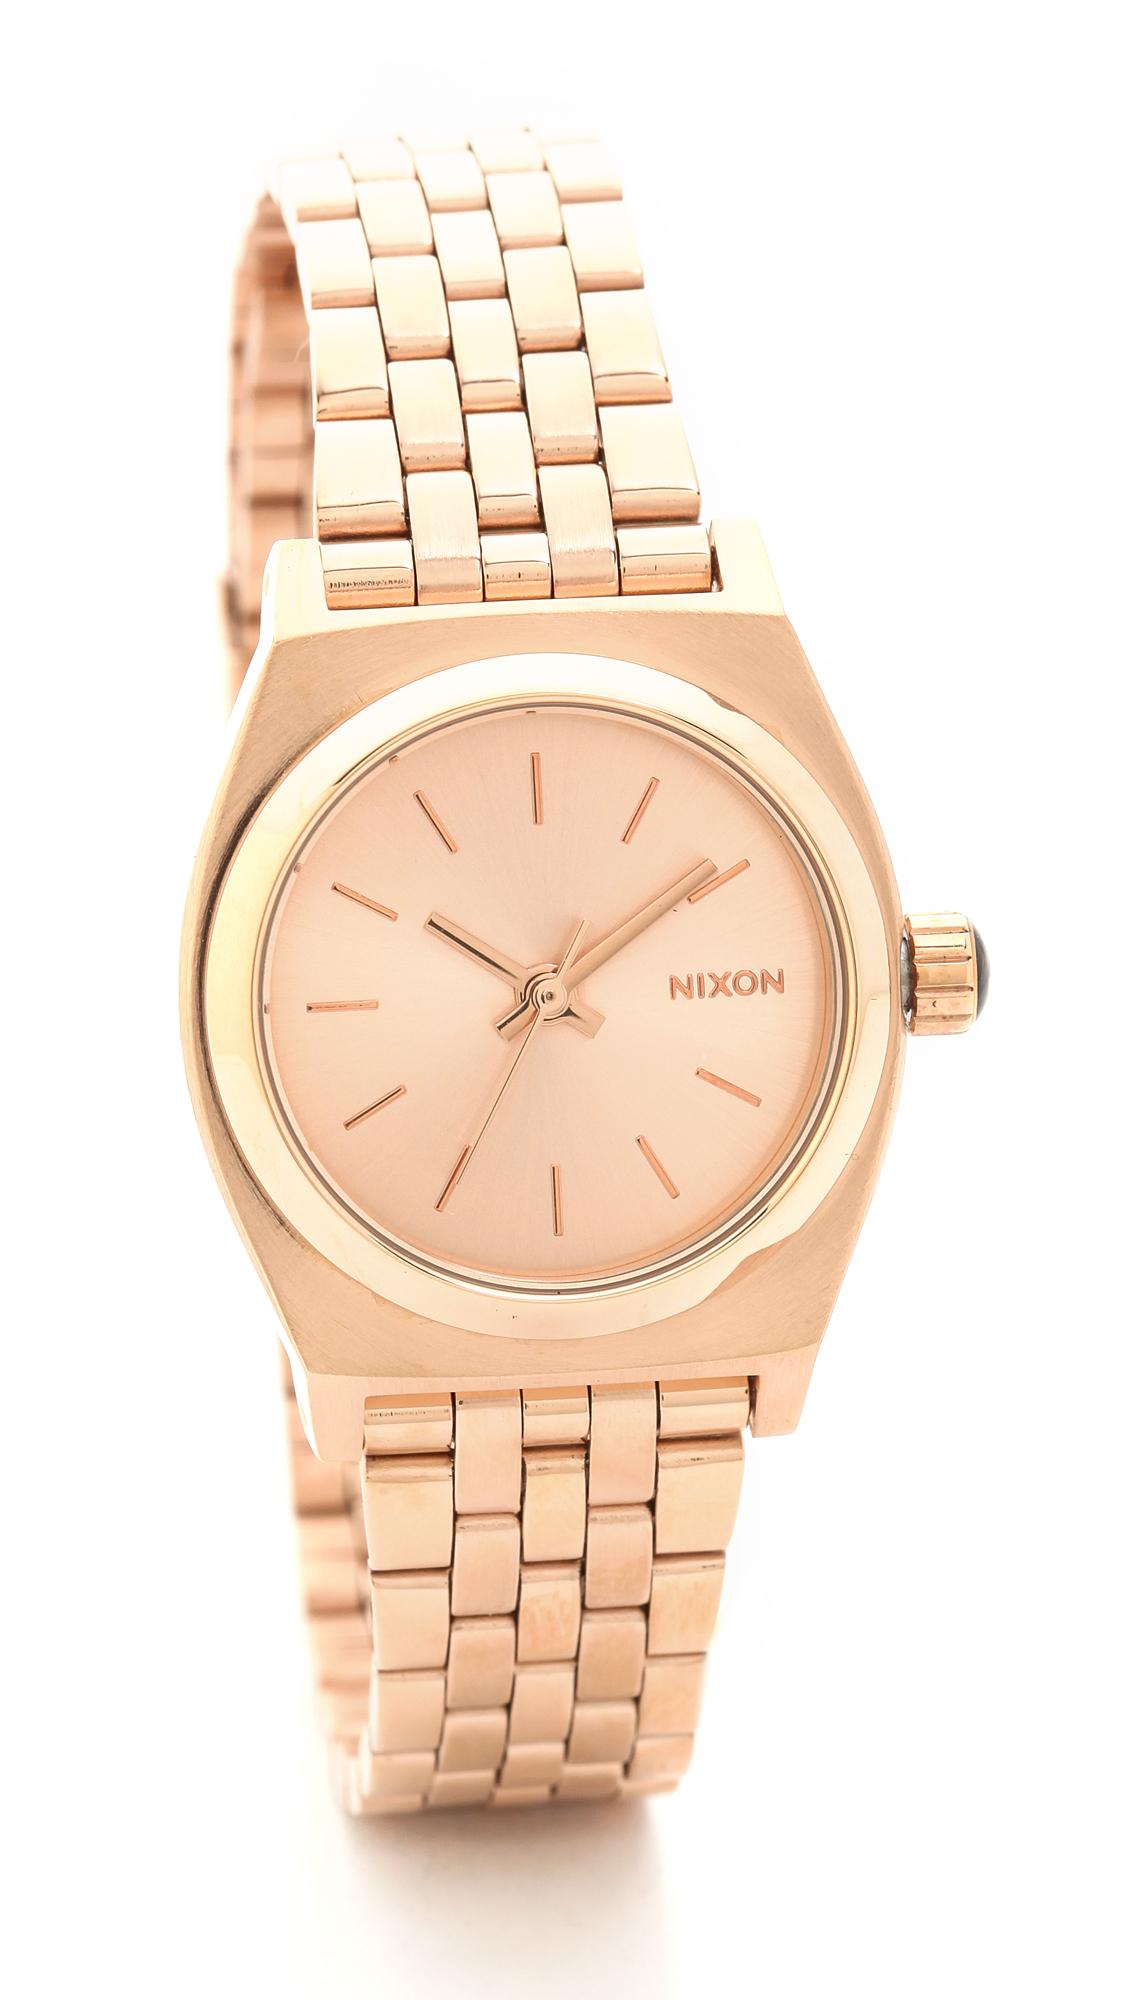 nixon time teller rose gold review